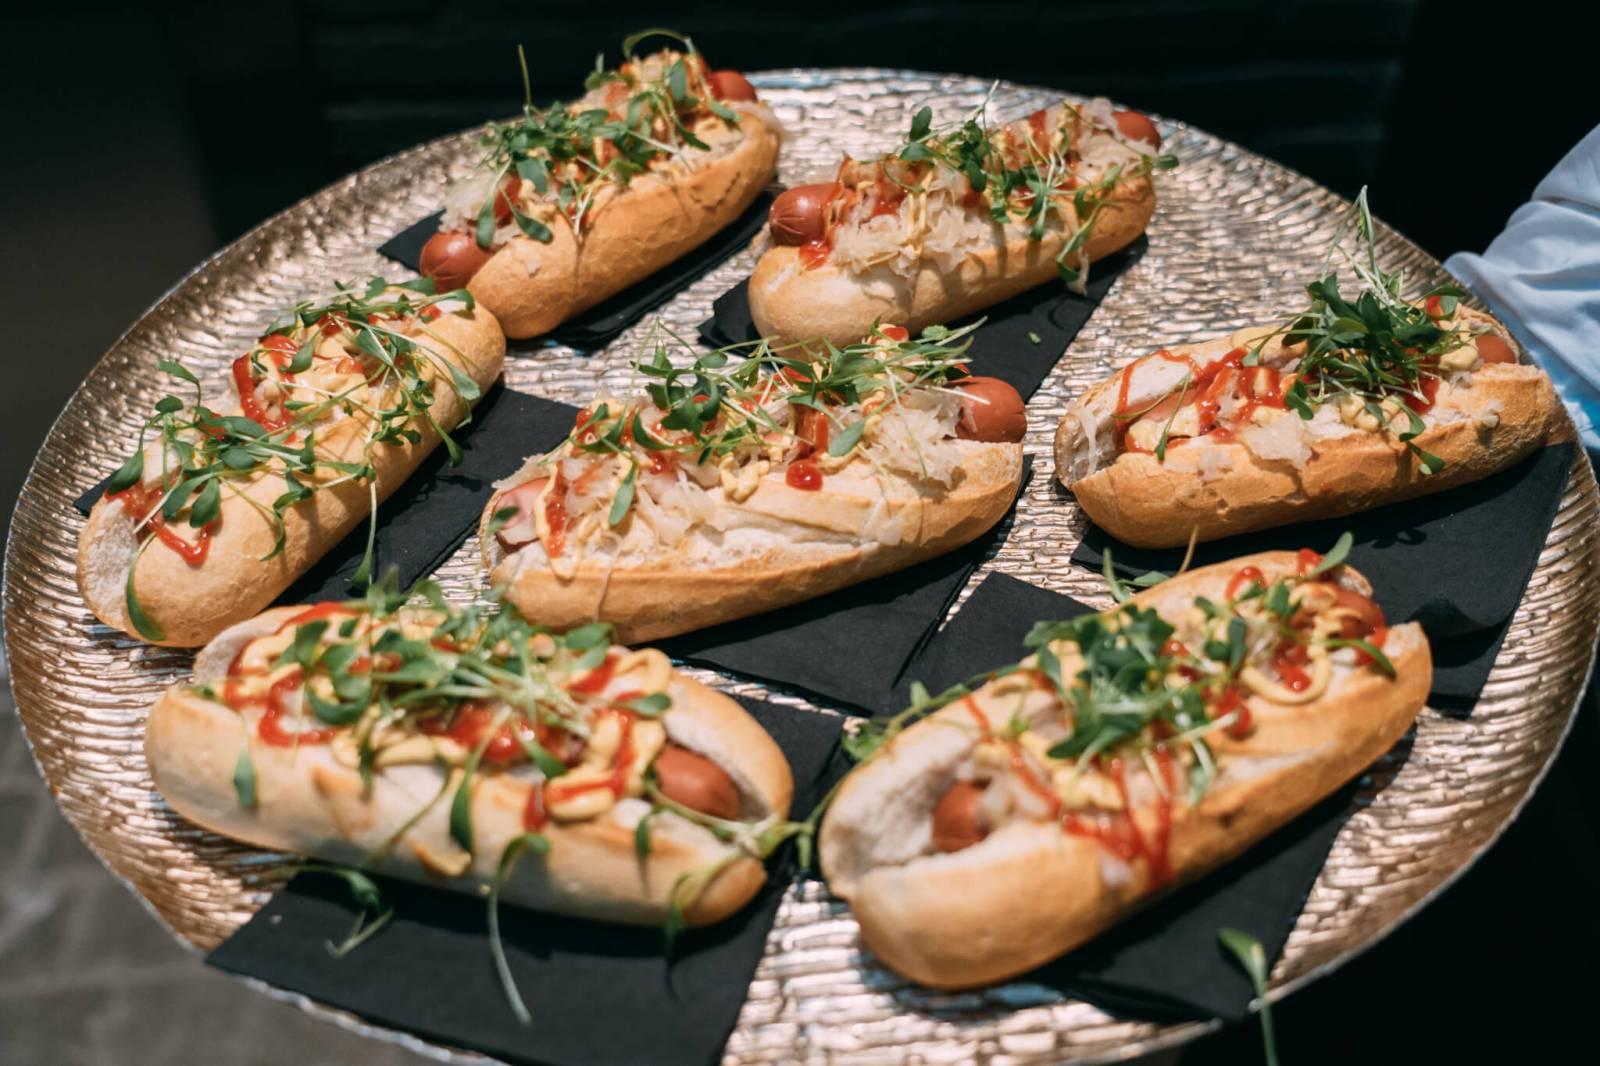 Klassieke-hot-dog-zuurkool-mosterd-en-ketchup